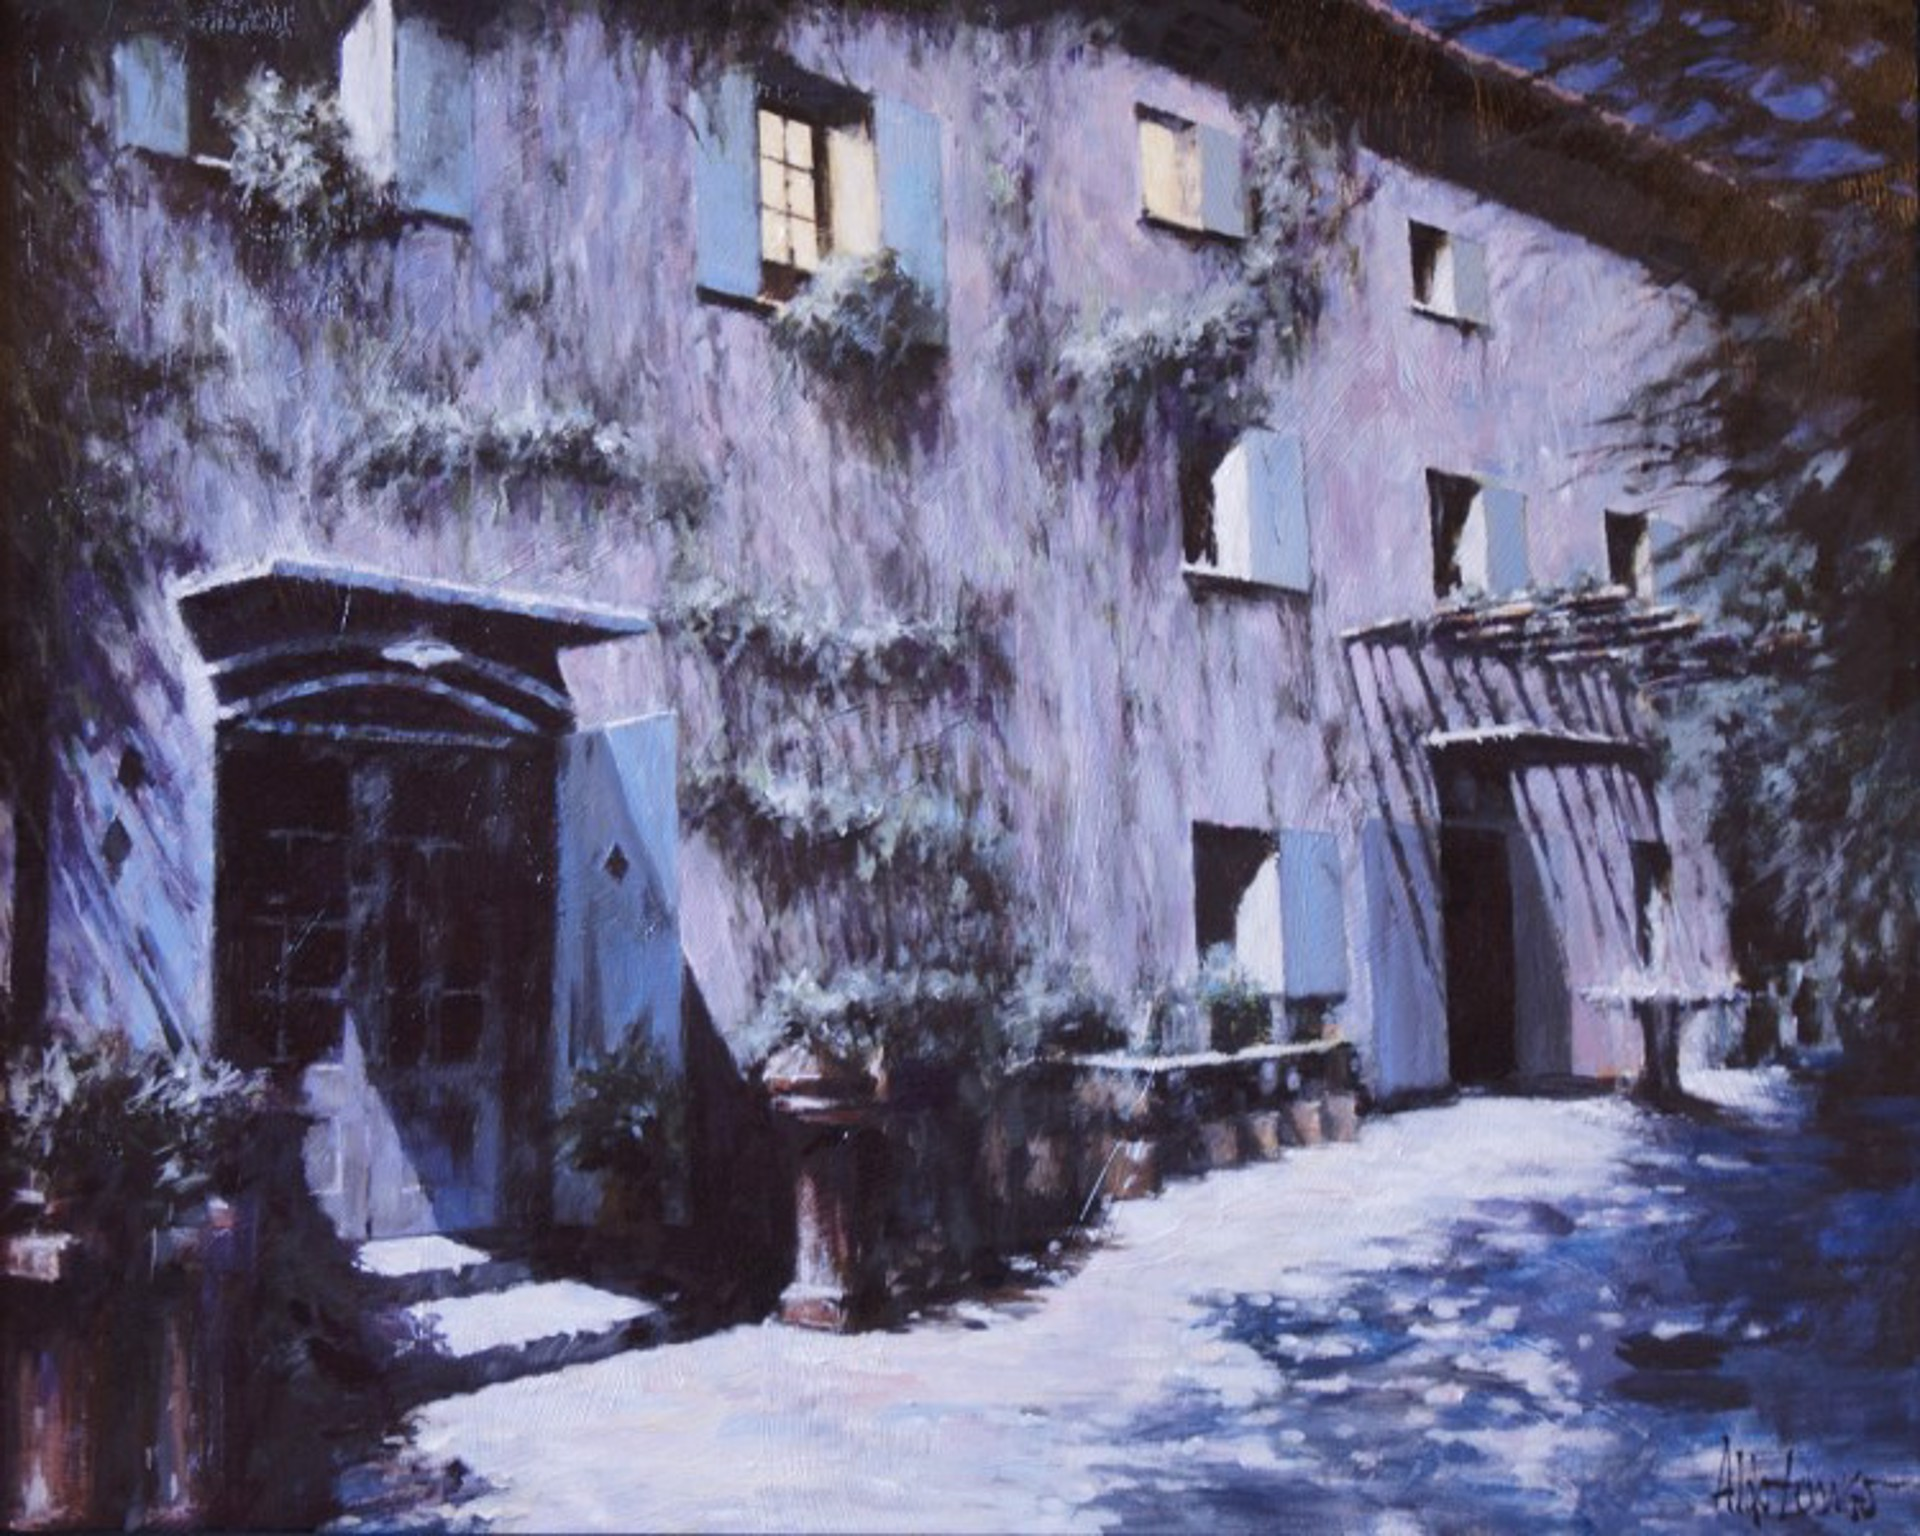 Moonlight en Provence by Aldo Luongo